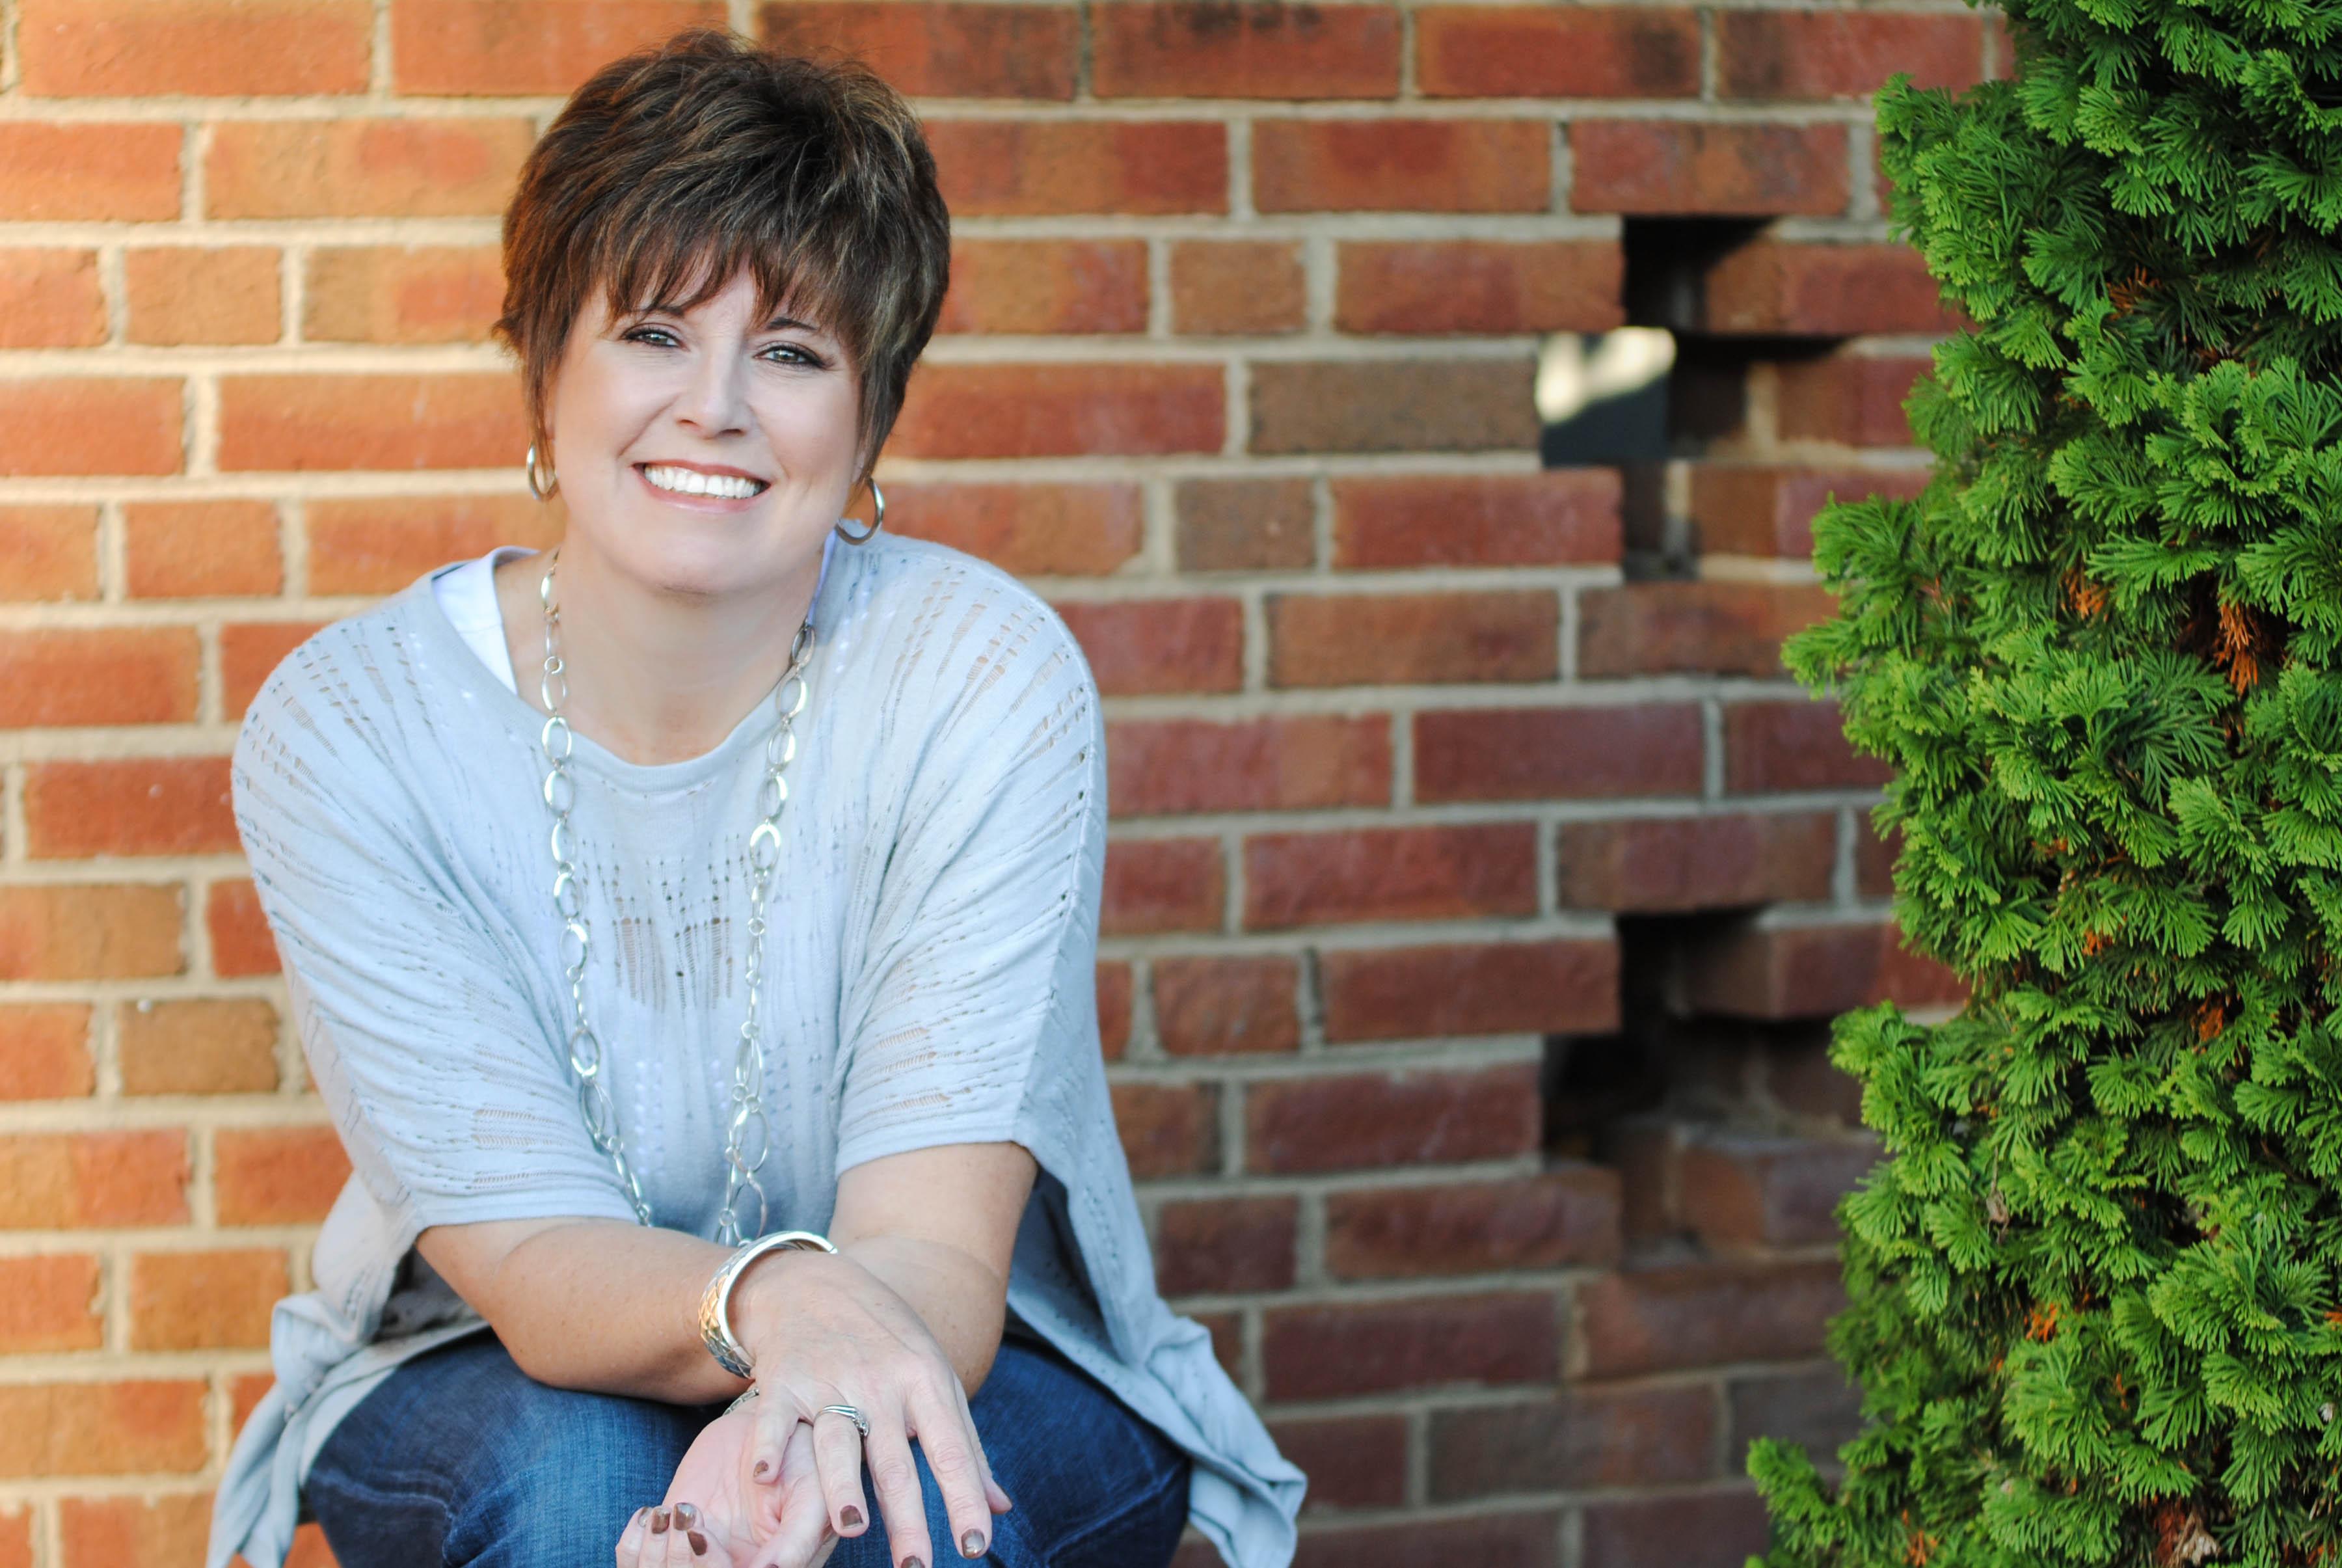 Author Wendy Pope